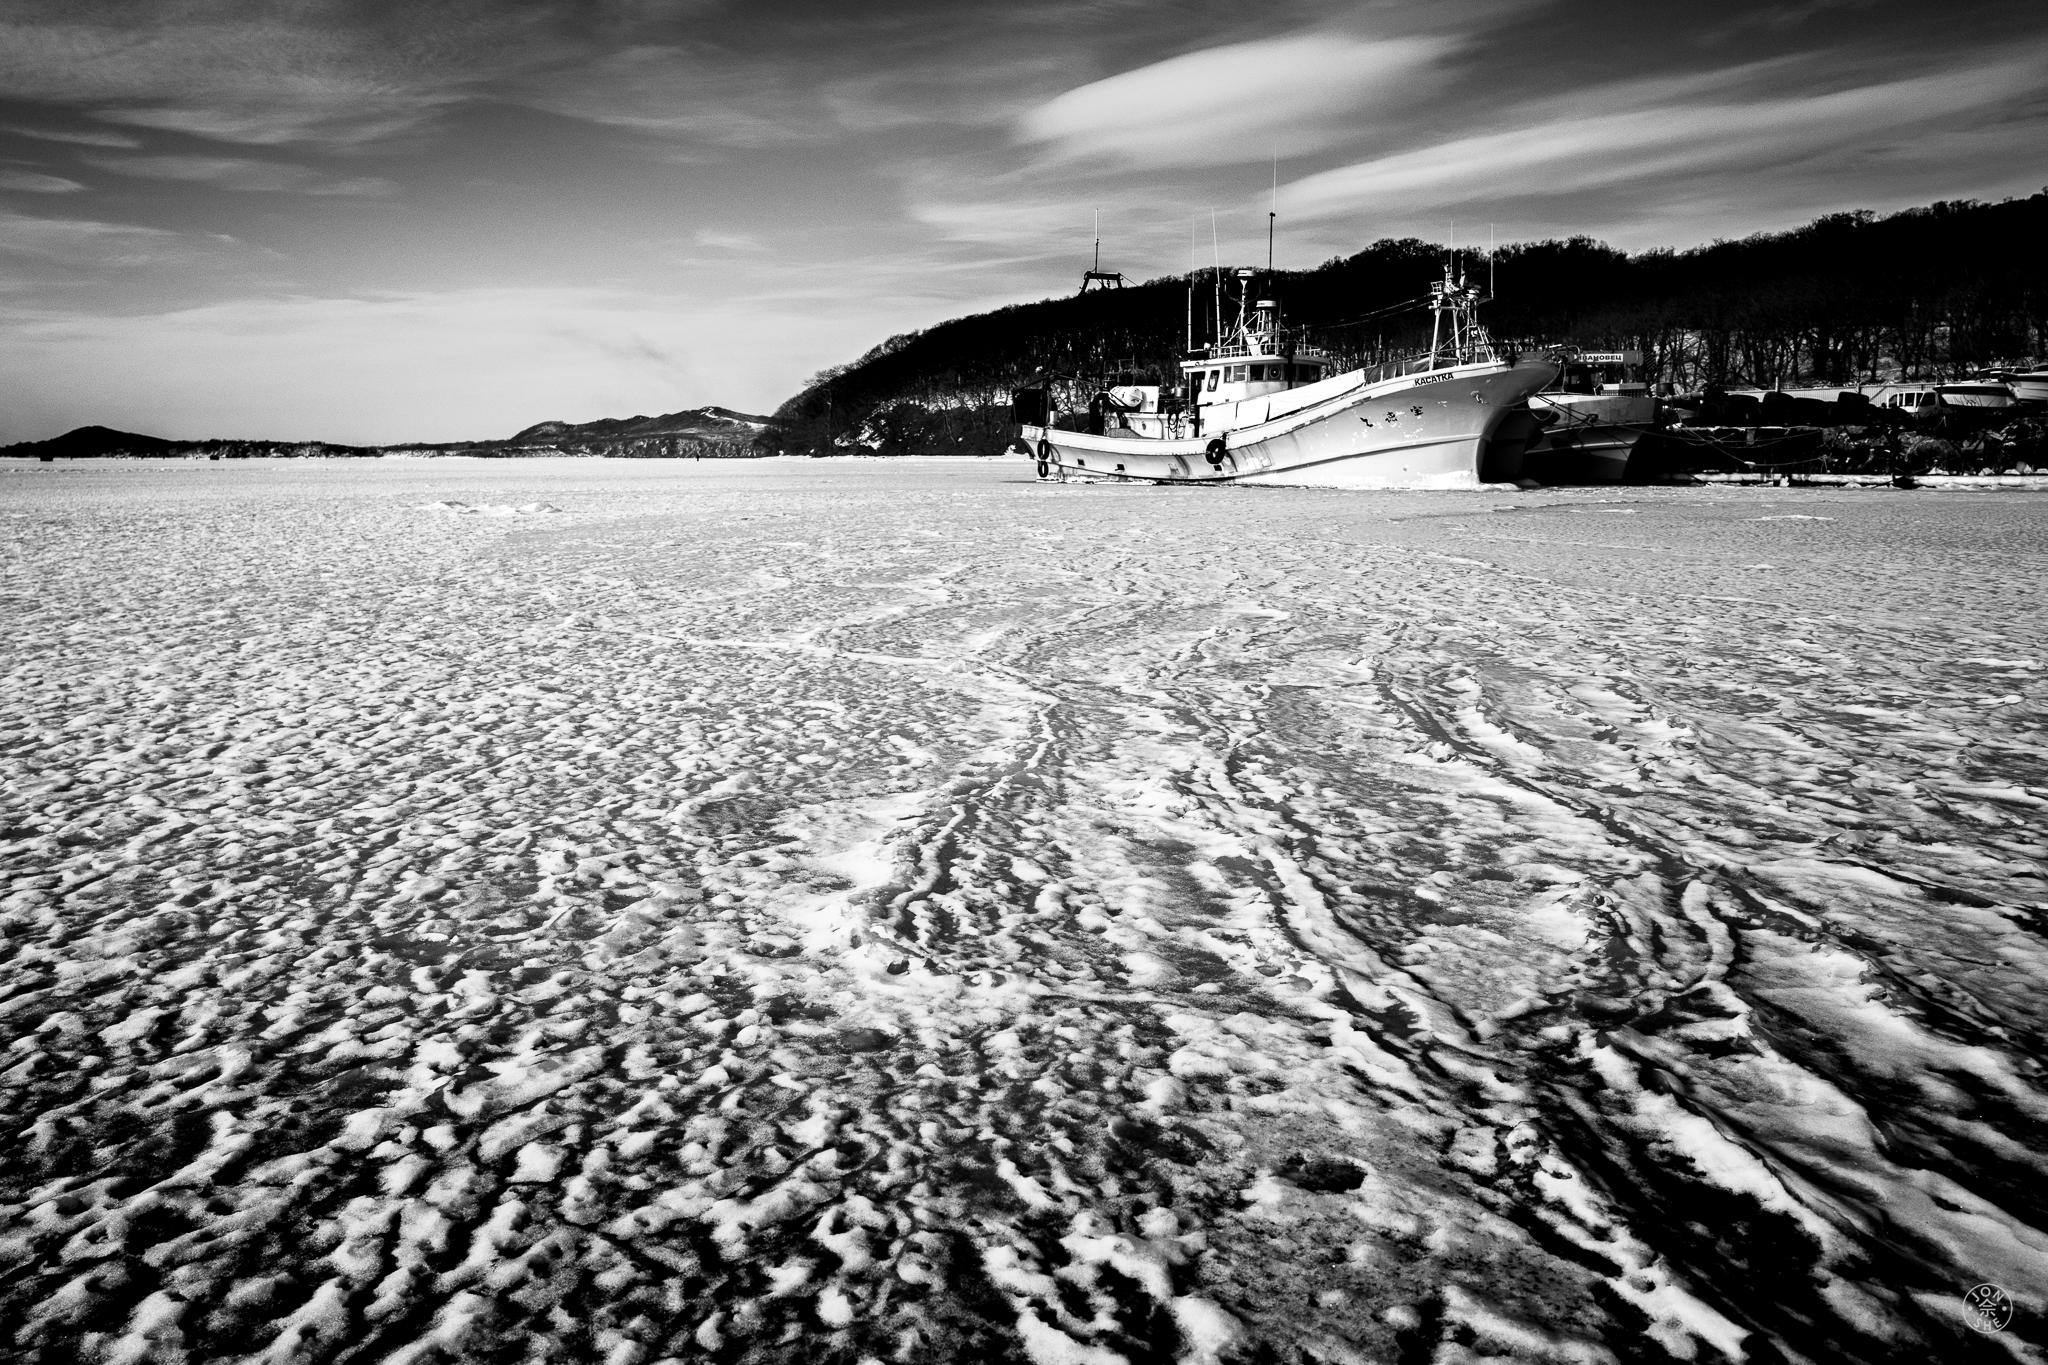 """Icy Ship"".  Vladivostok, Primorsky Krai, Far East Russia. January 2017. © Jon She. Leica Q (Typ 116), Leica Summilux 28mm f/1.7 ASPH (FLE)."